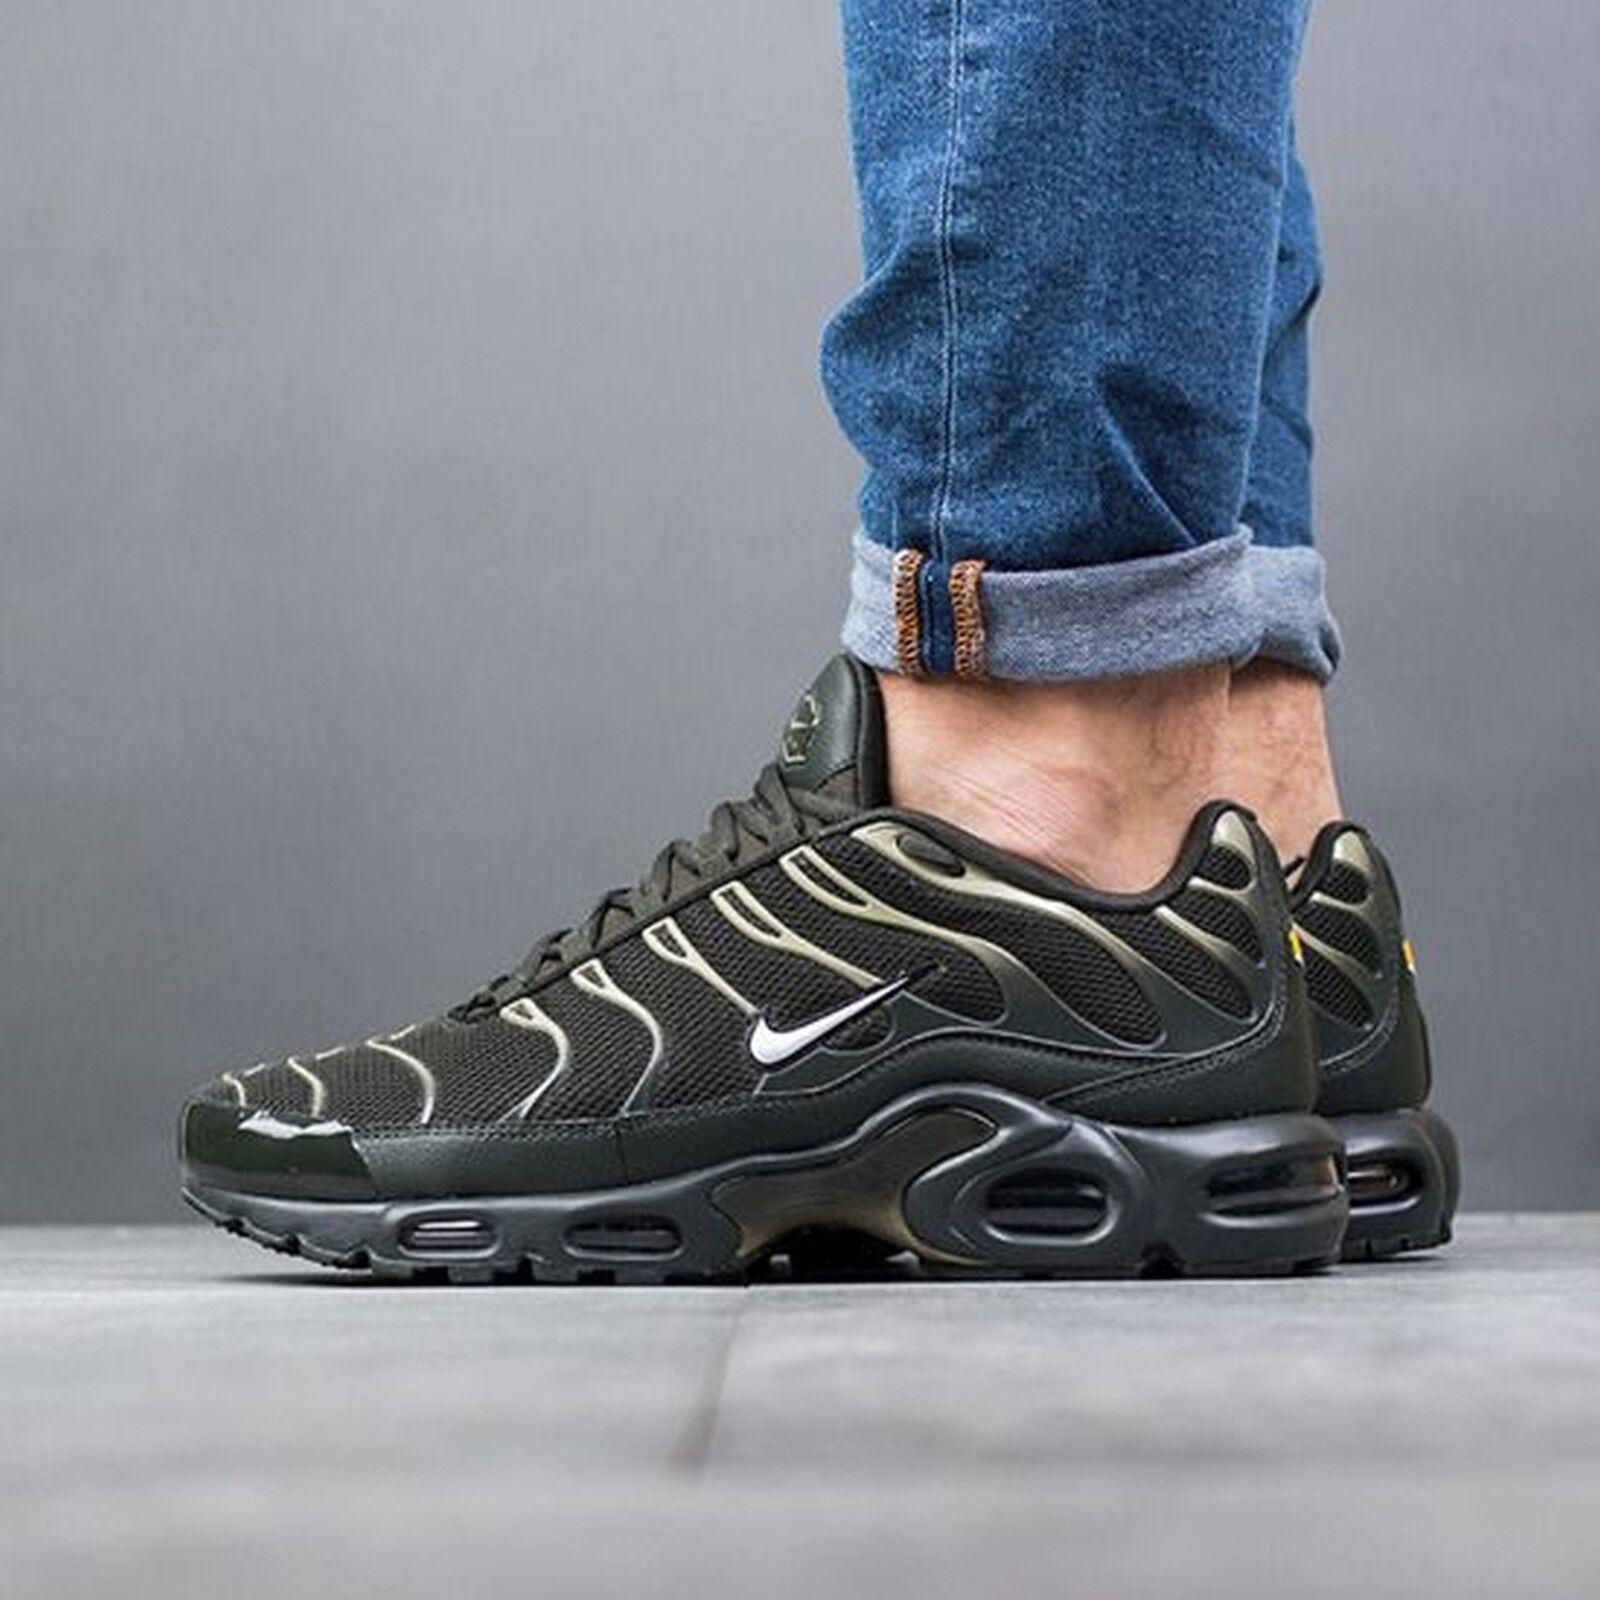 Nike Air Max PLUS Sequoia White Neutral 8.5 Olive Running Mens Sz 8.5 Neutral 852630 301 92aa35